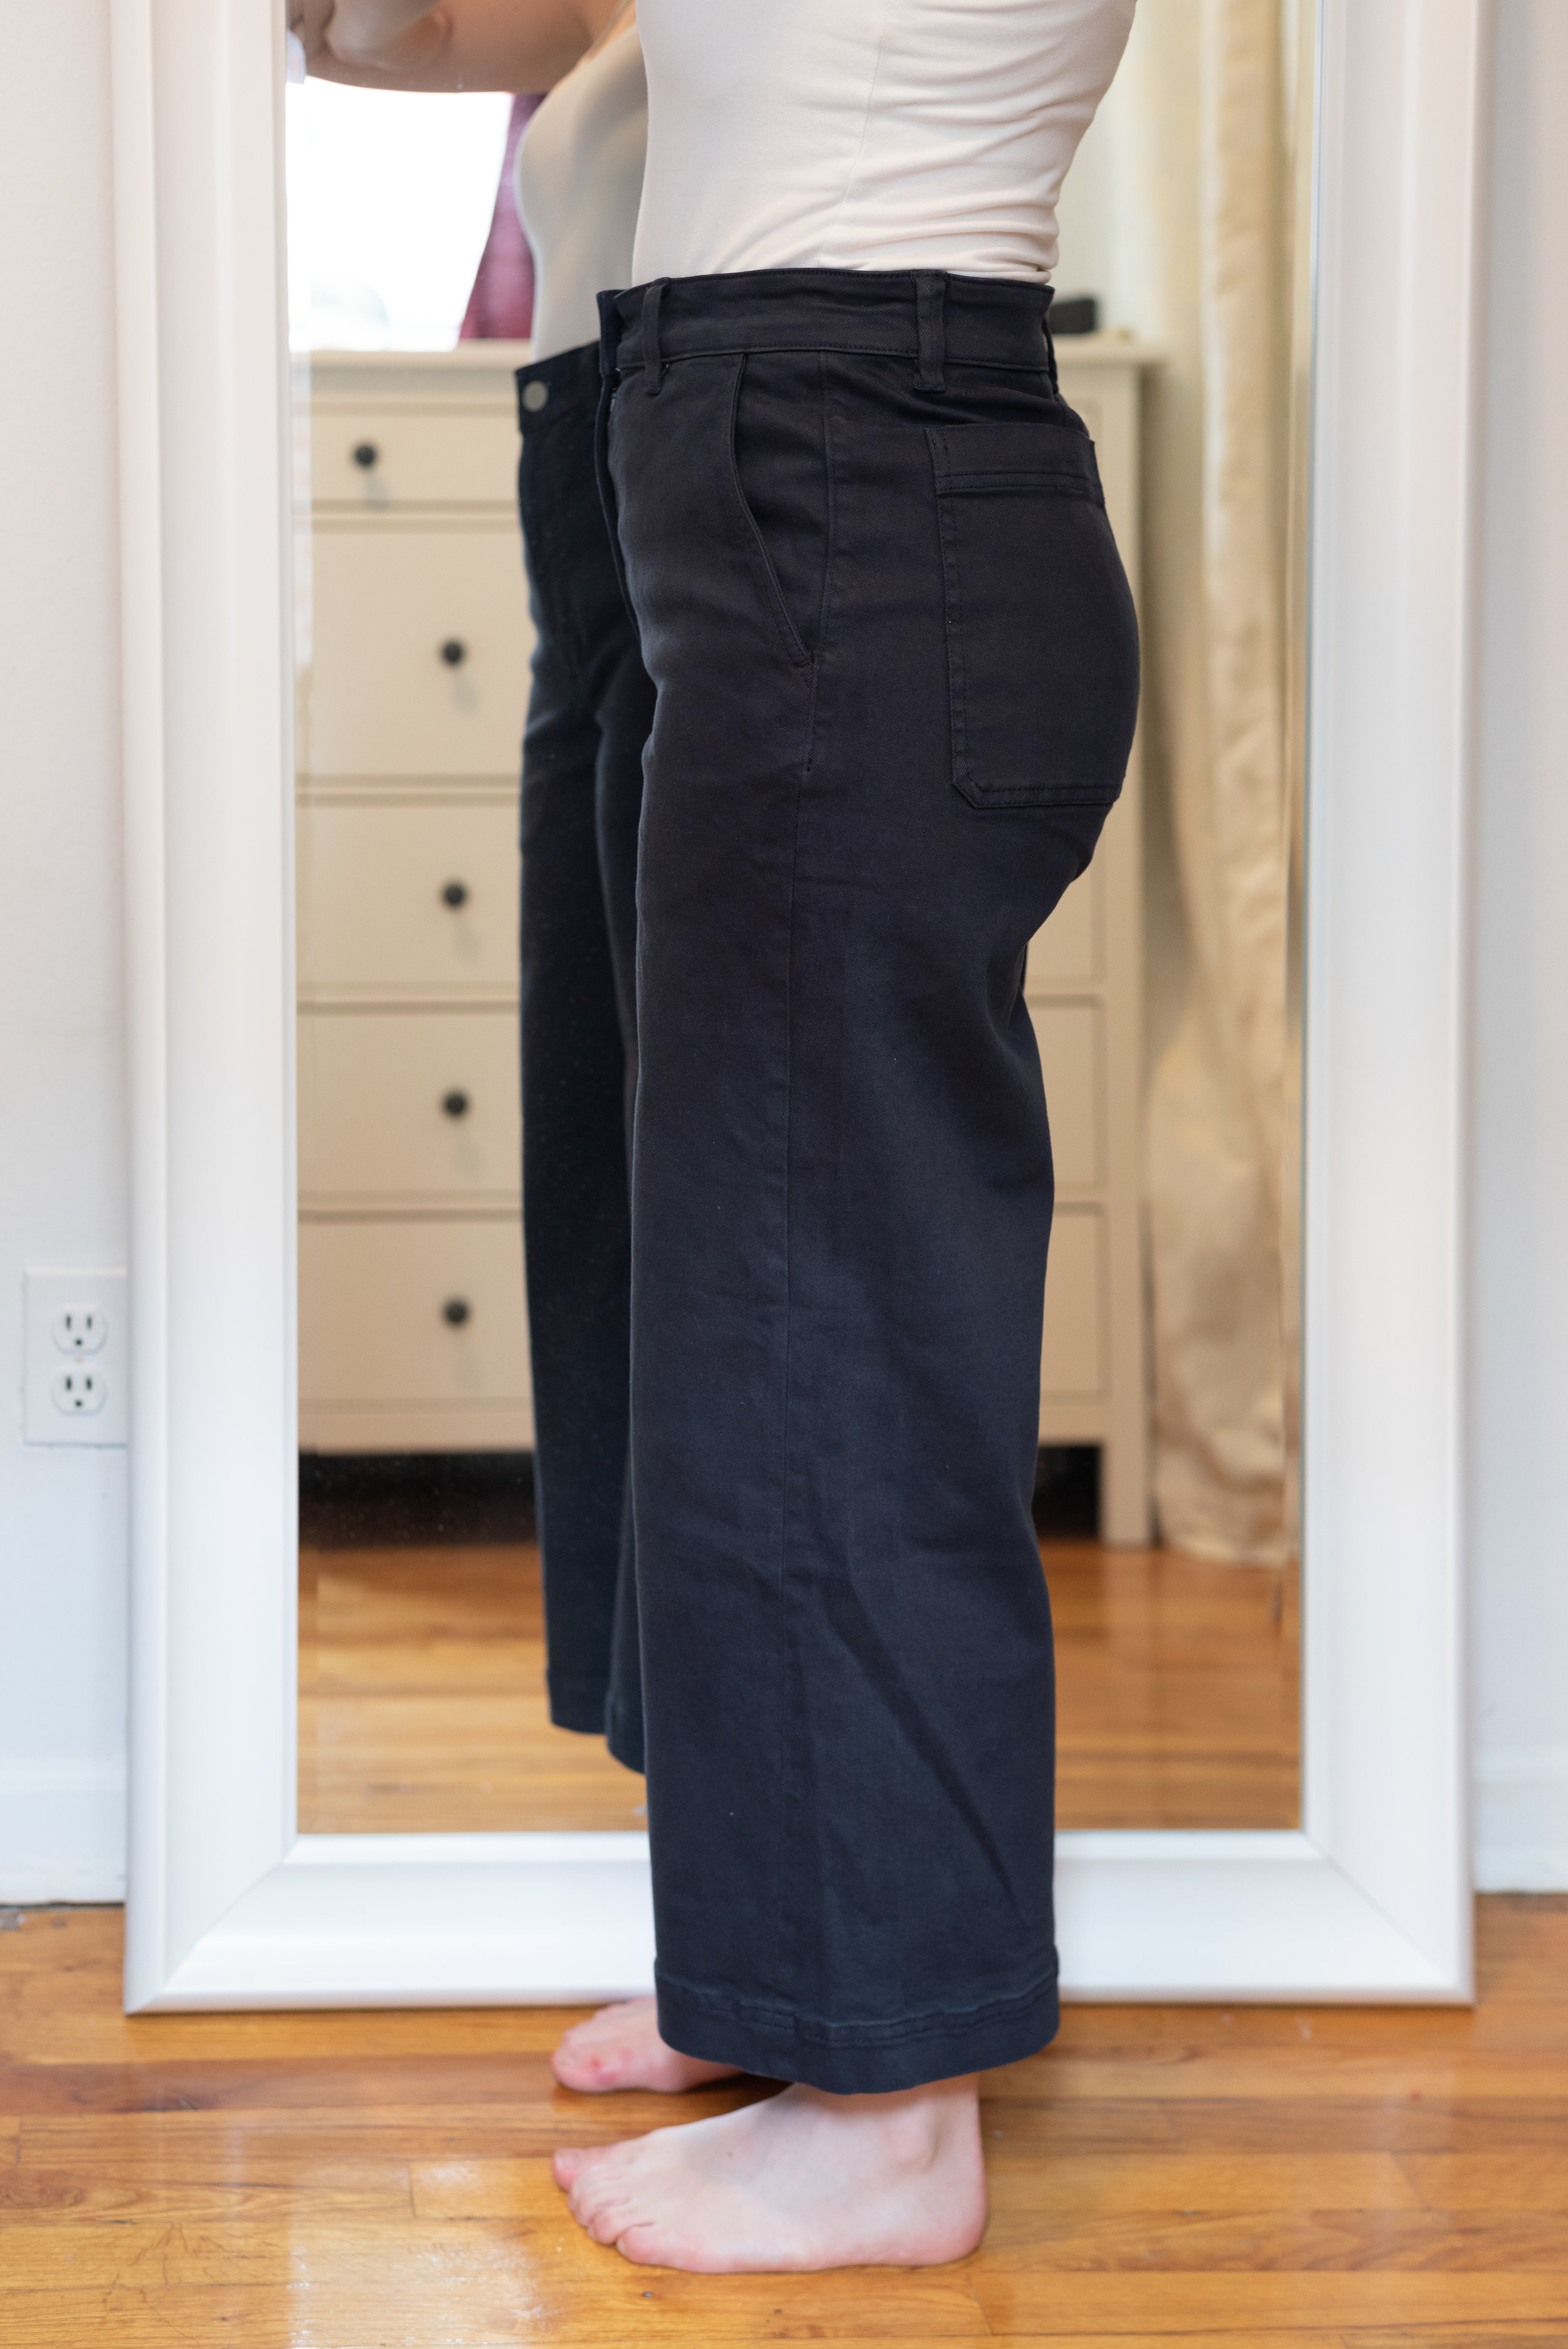 Everlane Wide Leg Crop Pant - Size 6 Short